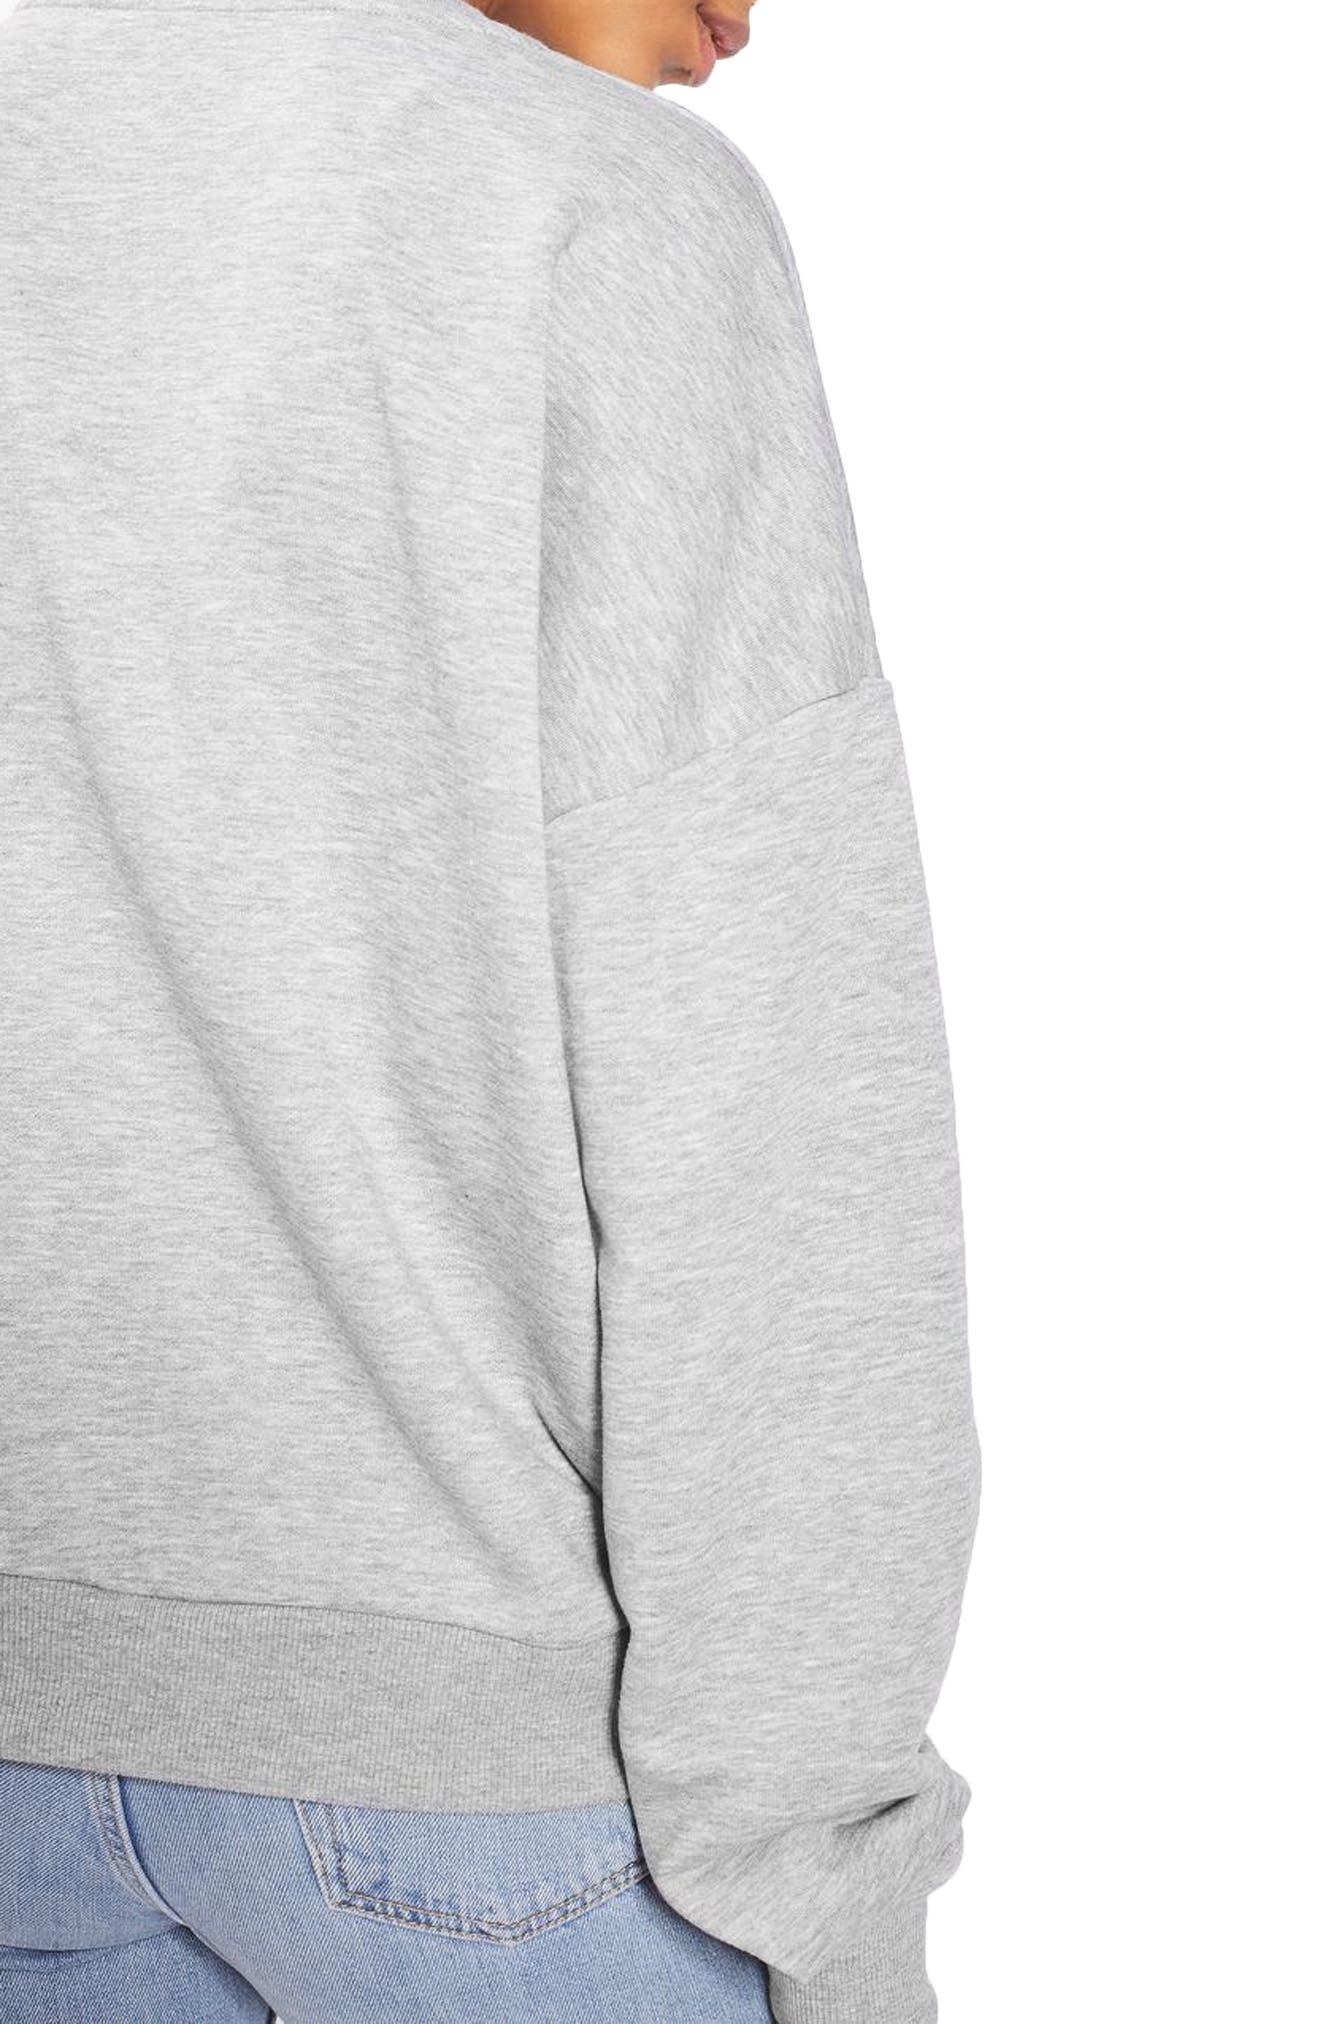 TOPSHOP,                             Feminist Sweatshirt,                             Alternate thumbnail 2, color,                             020